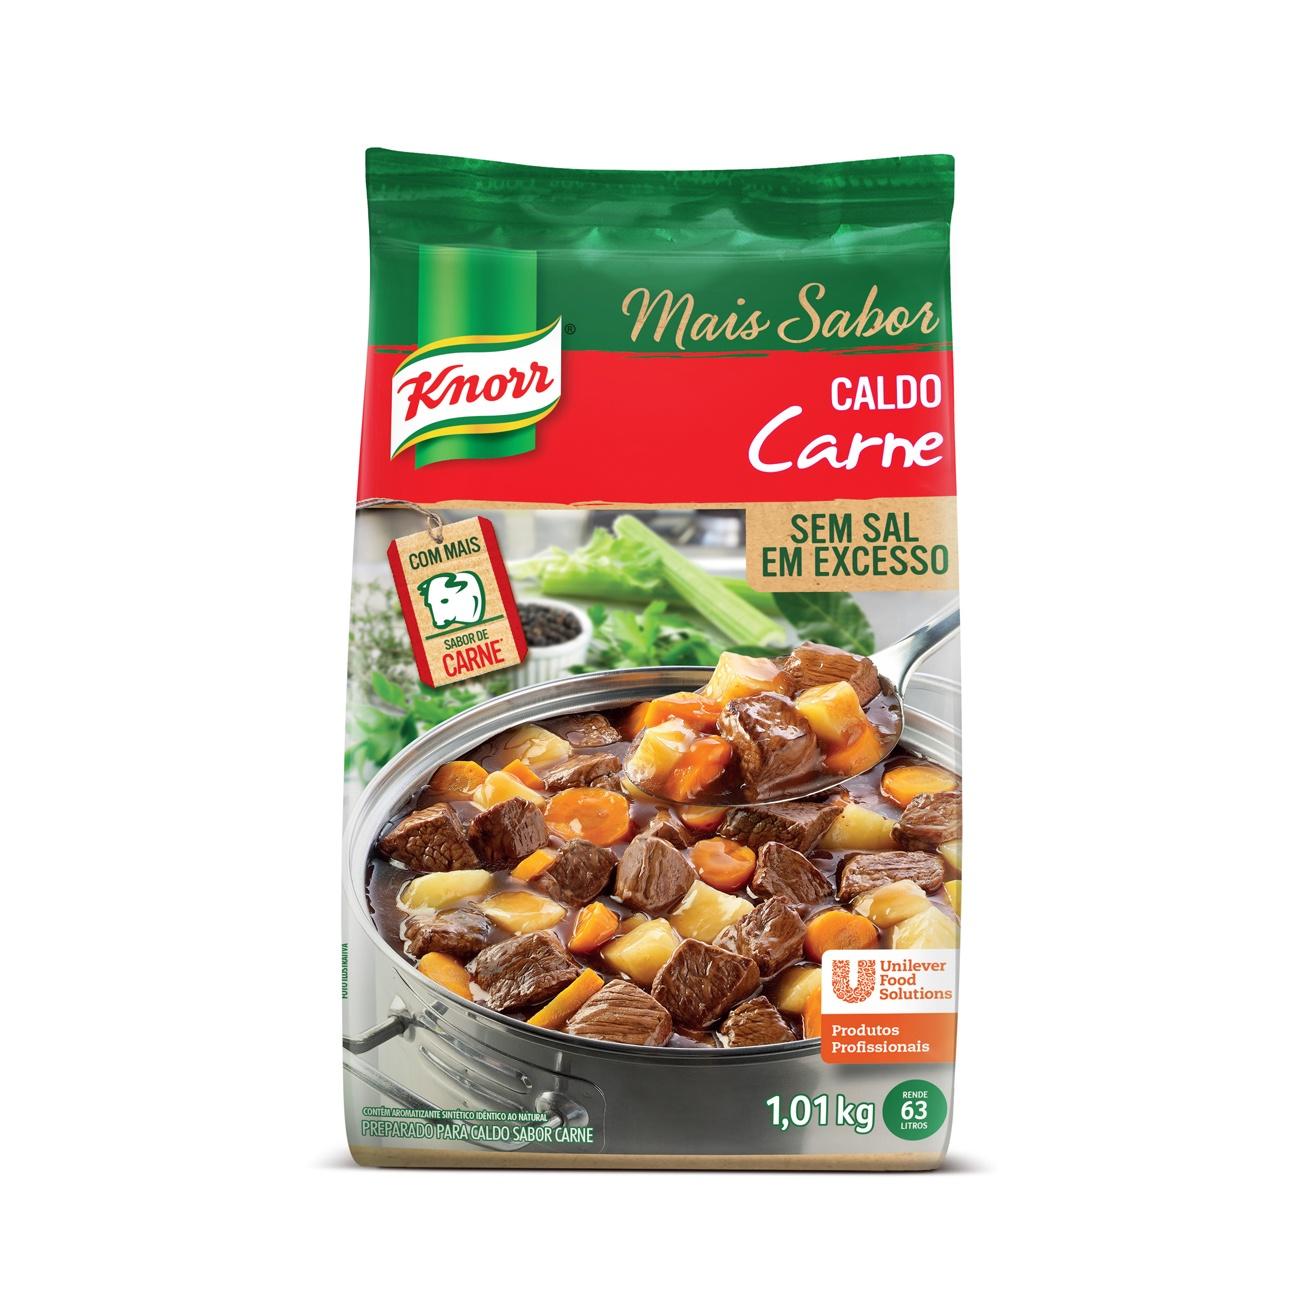 Caldo de Carne Knorr 1,01Kg